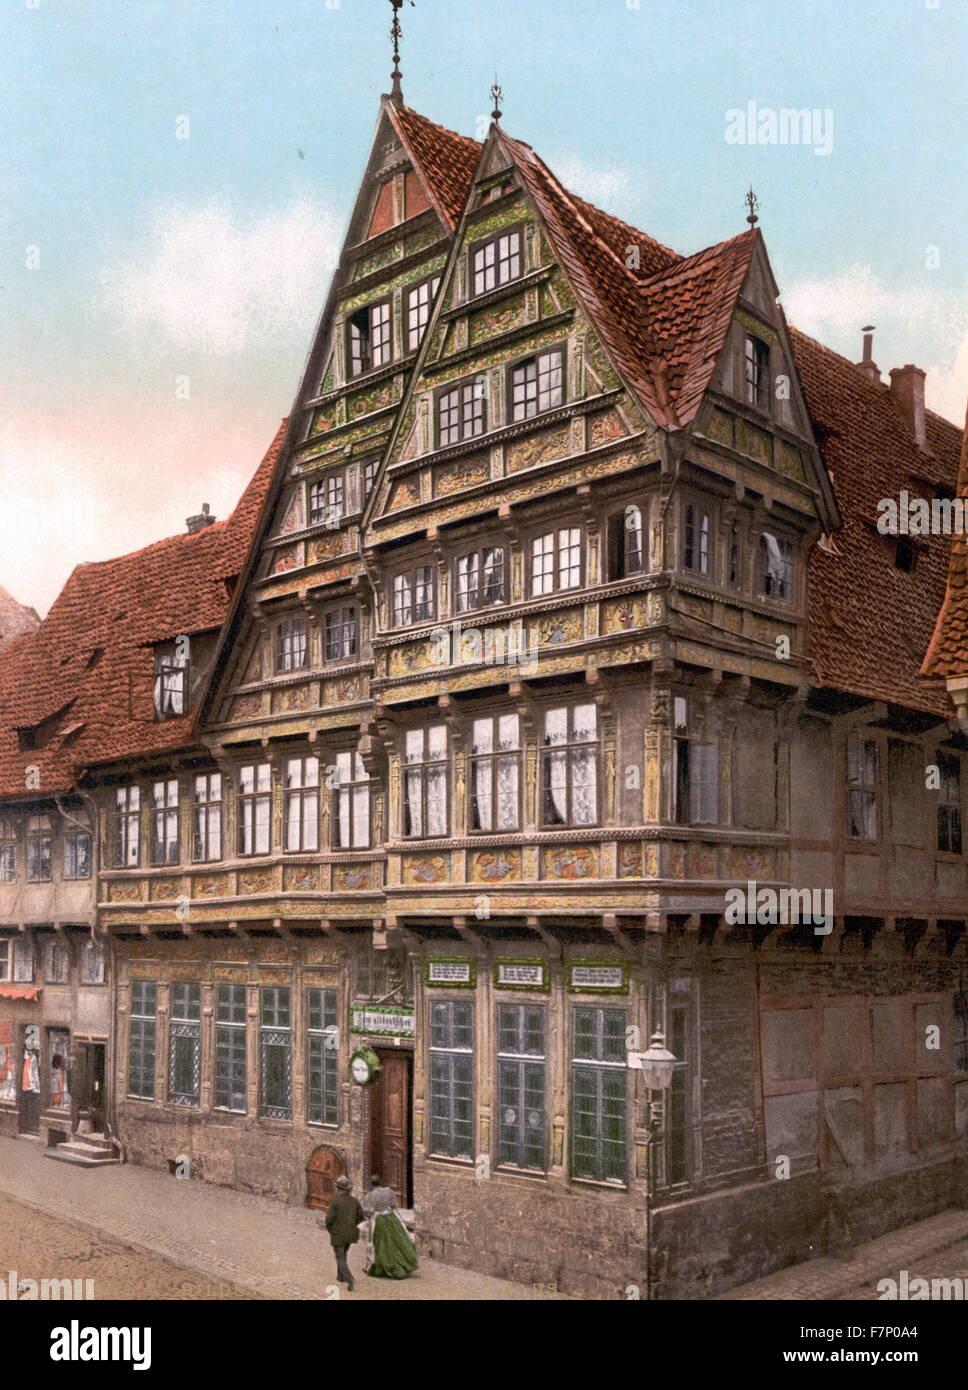 Altes Haus, Hildesheim, Hannover, 1890 Stockbild